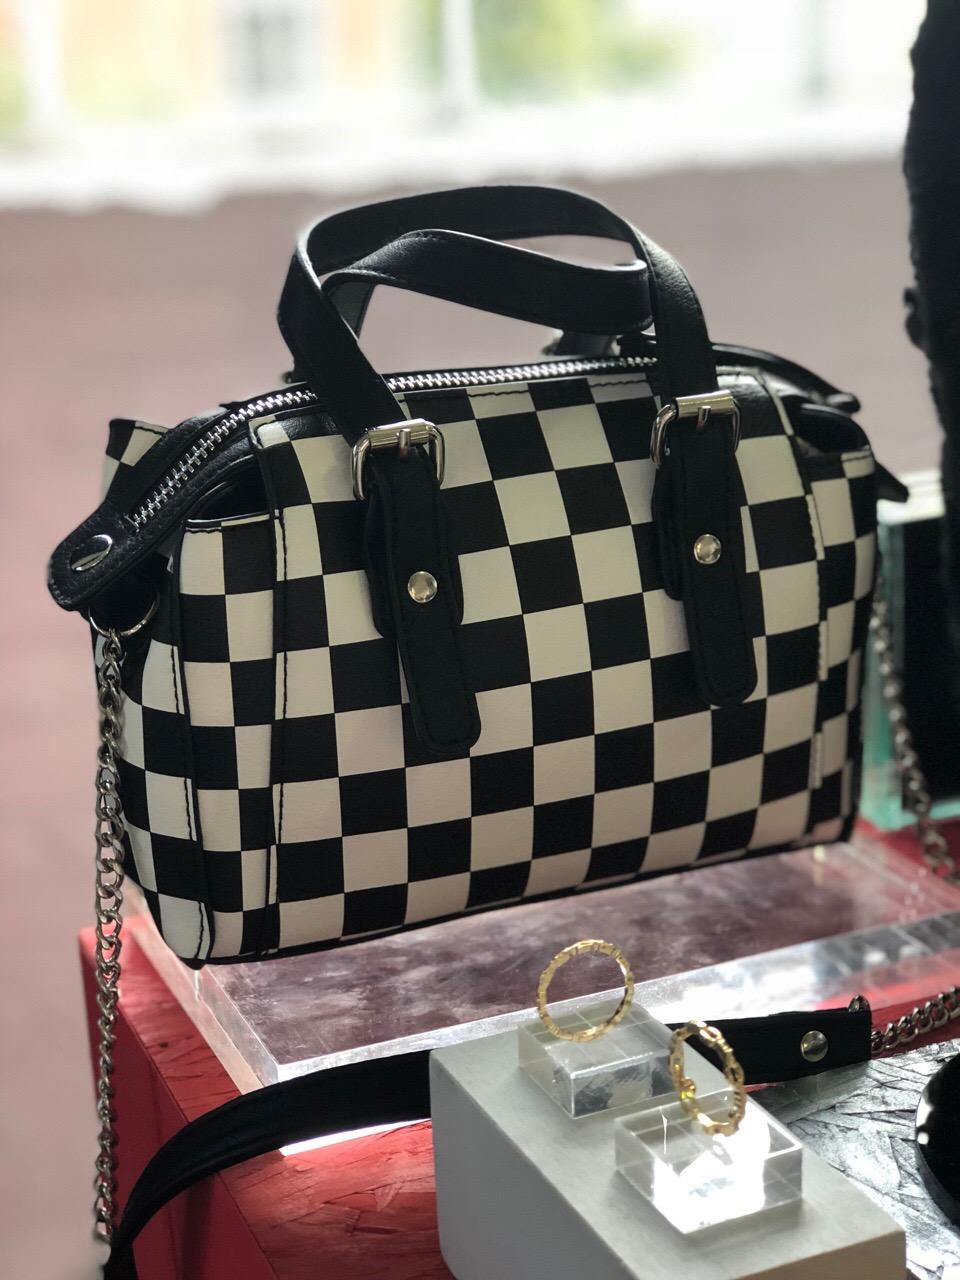 6f0b2a40aa4 This checkerboard mini crossbody bag is definitely a wardrobe want